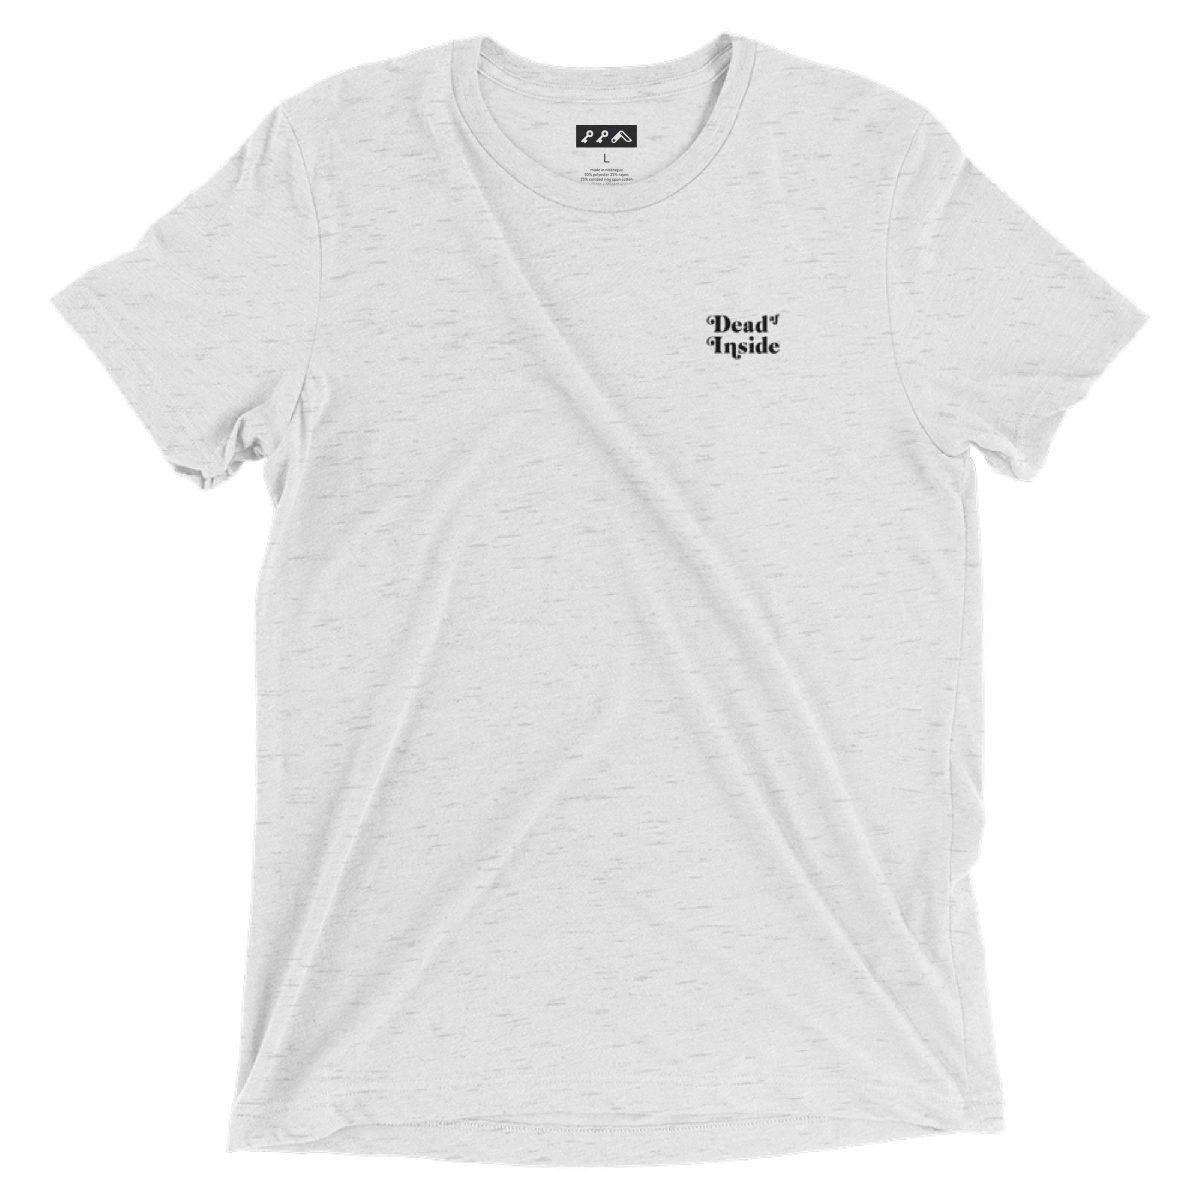 DEAD AF INSIDE t-shirts by kikicutt